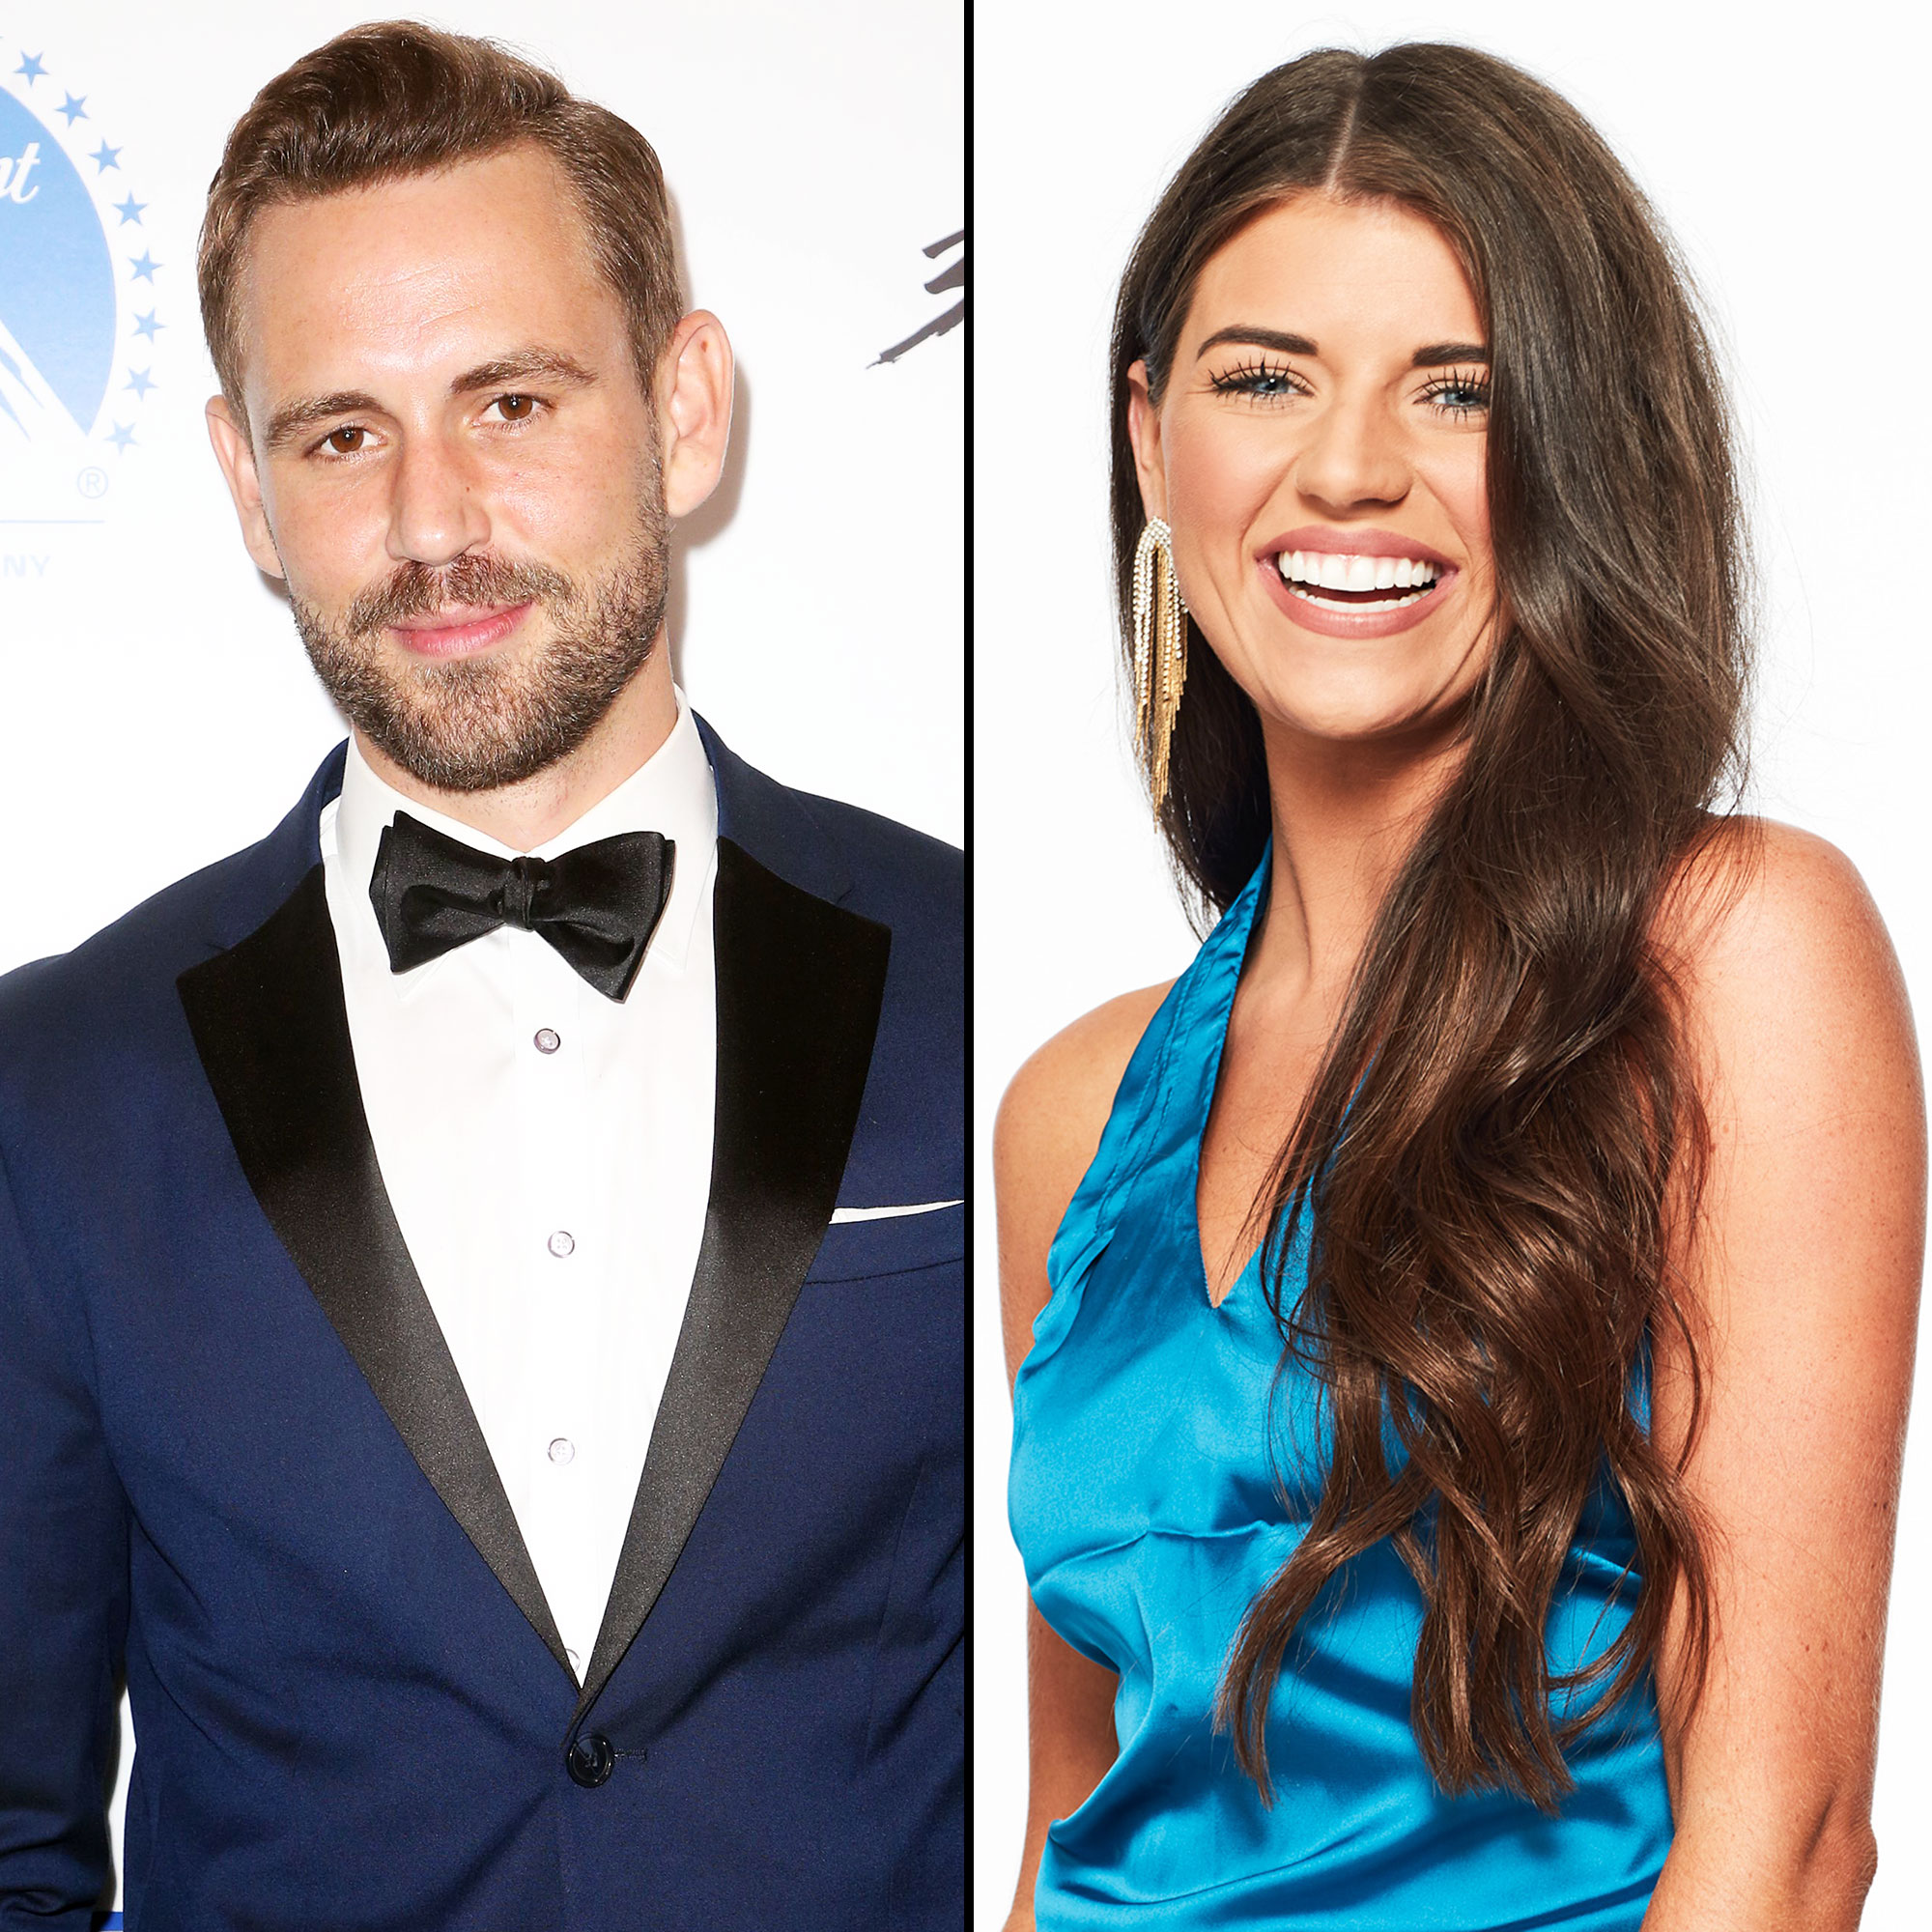 Nick Viall Calls Out Bachelor Alum Madison Prewett for Lying